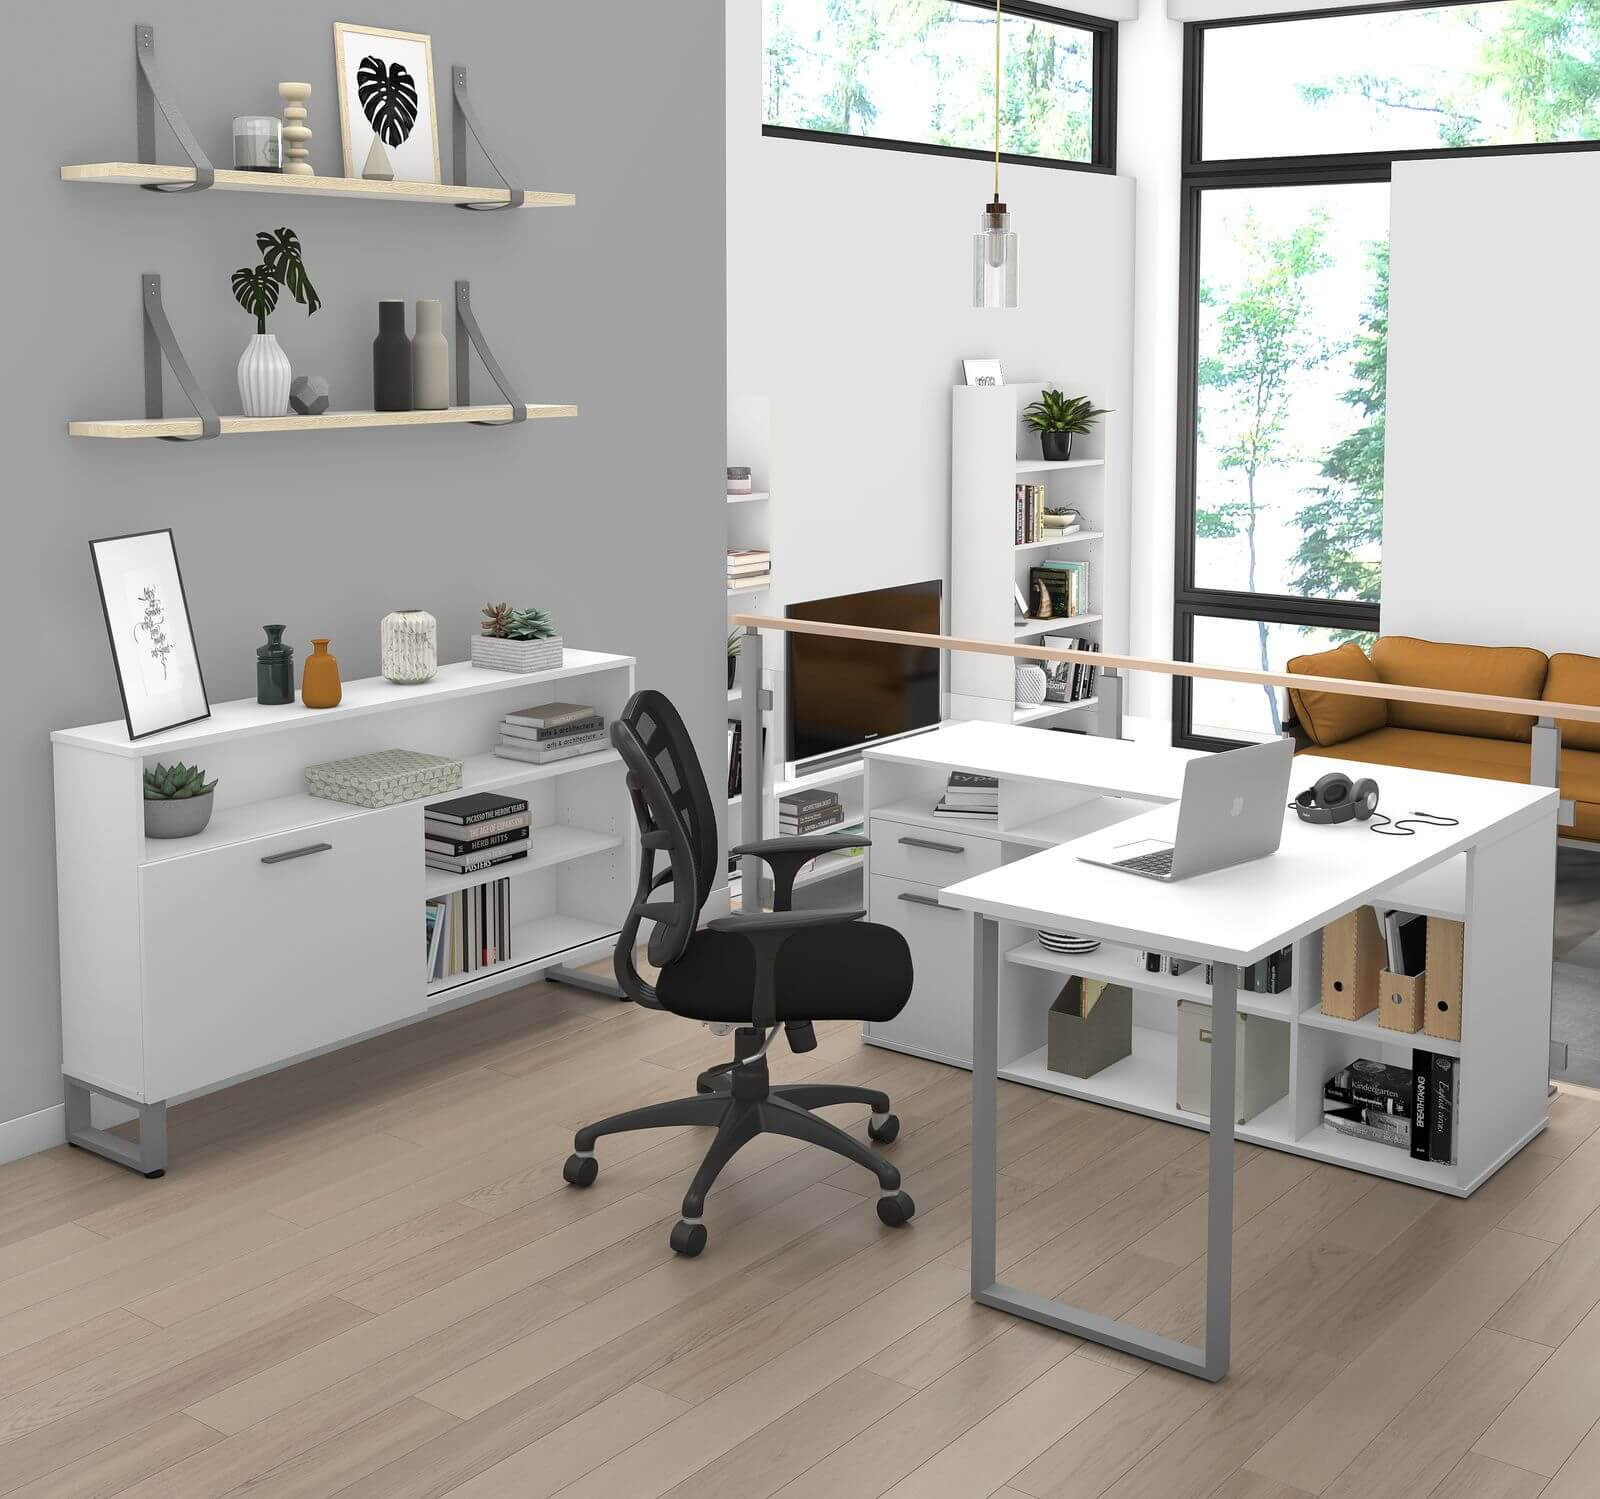 Bestar L-shaped desk with credenza